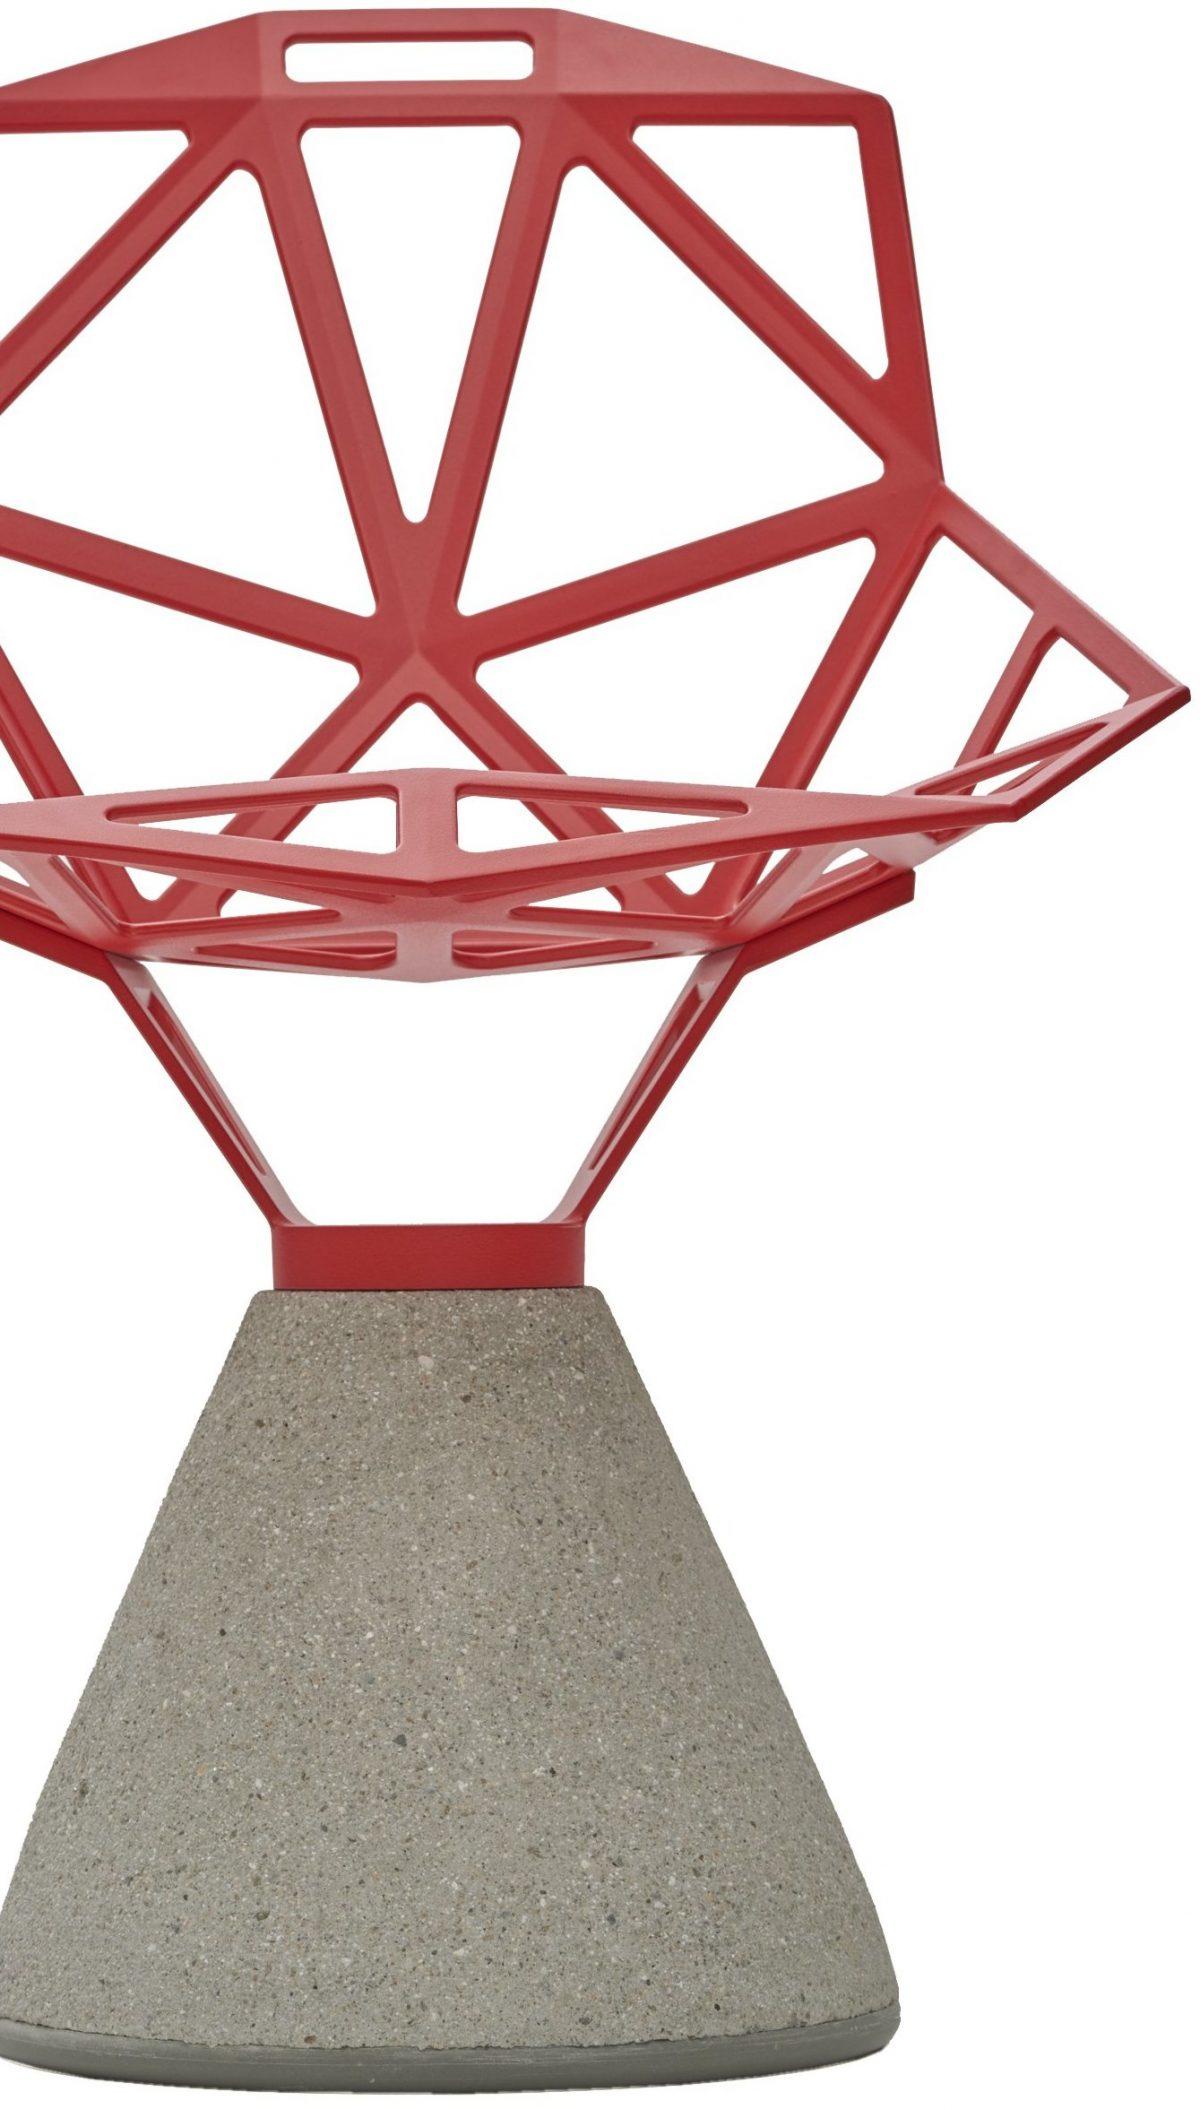 Grcic, Konstantin chair_ONE 2004 Metall (Aluminium), gegossen, rot lackiert, Beton, grau Herst.: Magis srl., Italien Foto: Die Neue Sammlung — The Design Museum